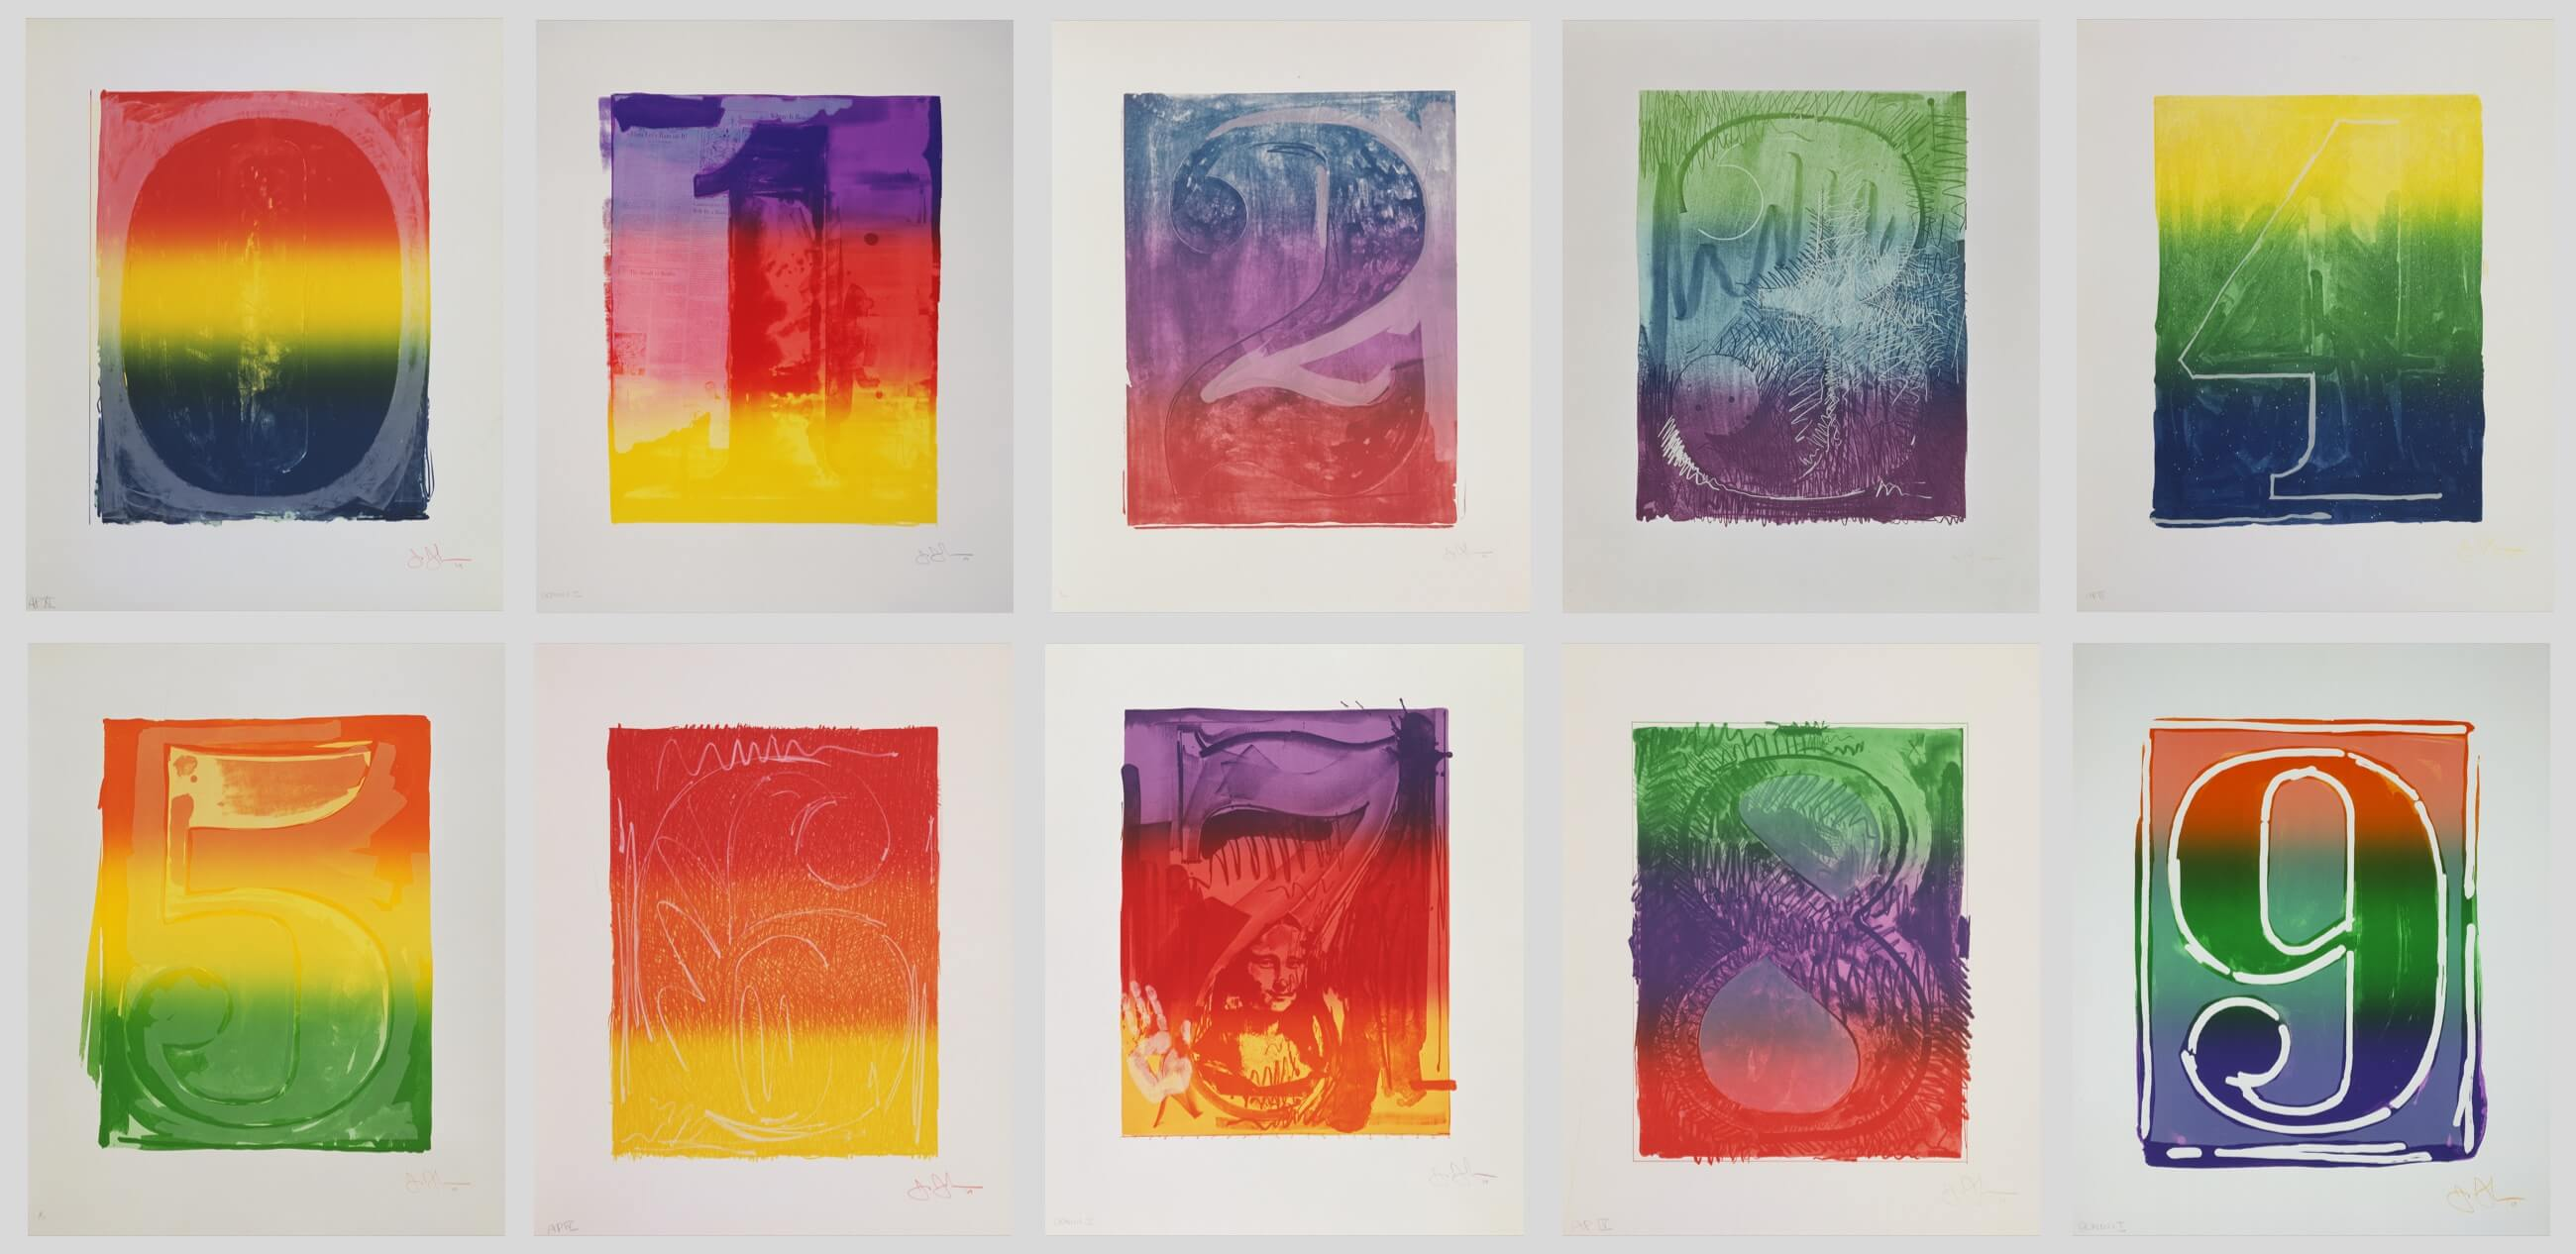 Figures 0–9, 1969, by Jasper Johns